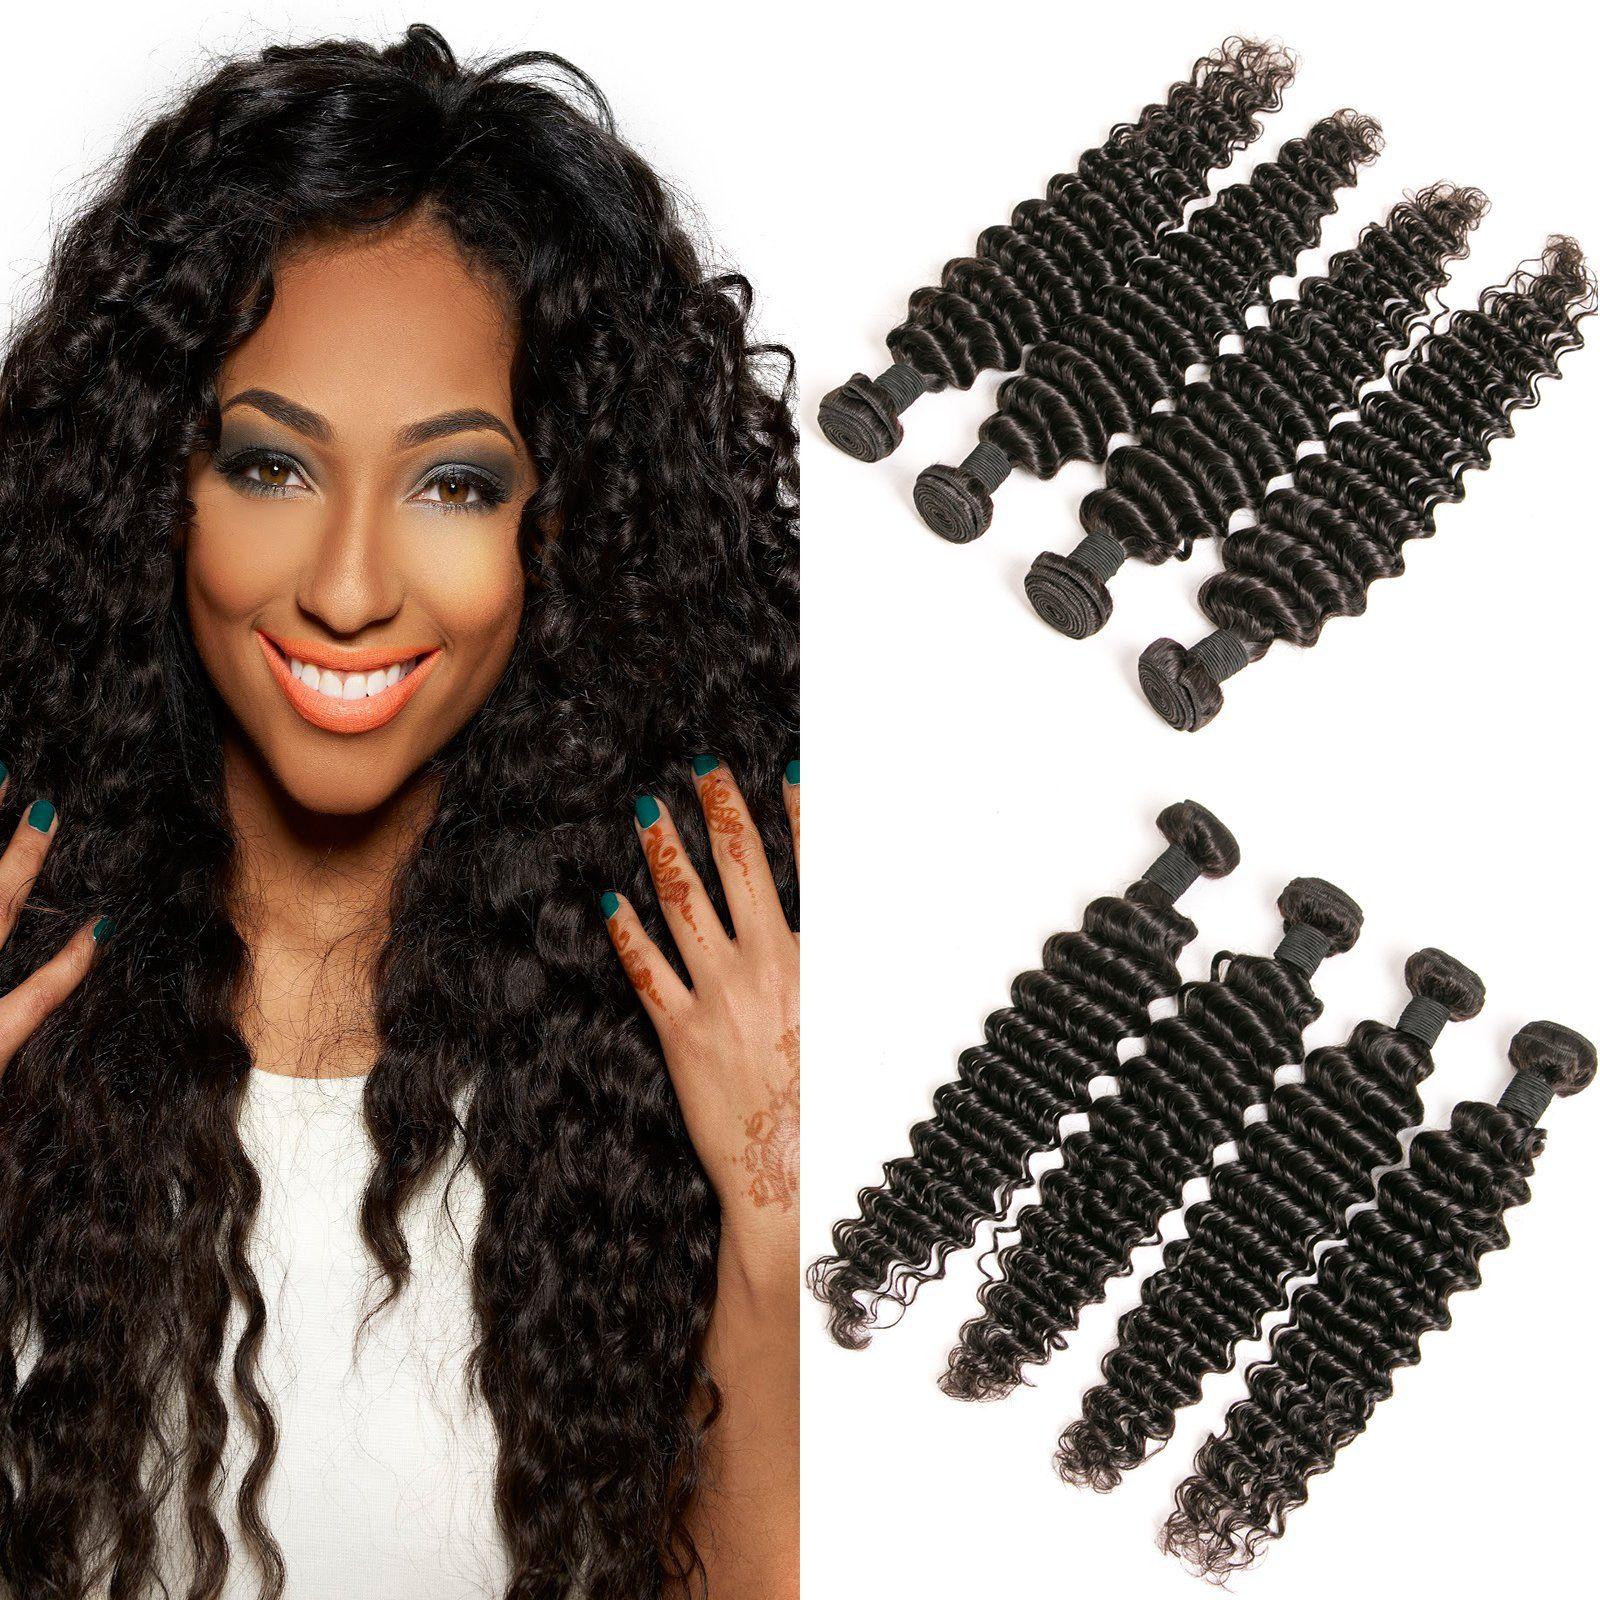 DAIMER Deep Wave 4 Bundles Brazilian Hair Unprocessed Raw Virgin